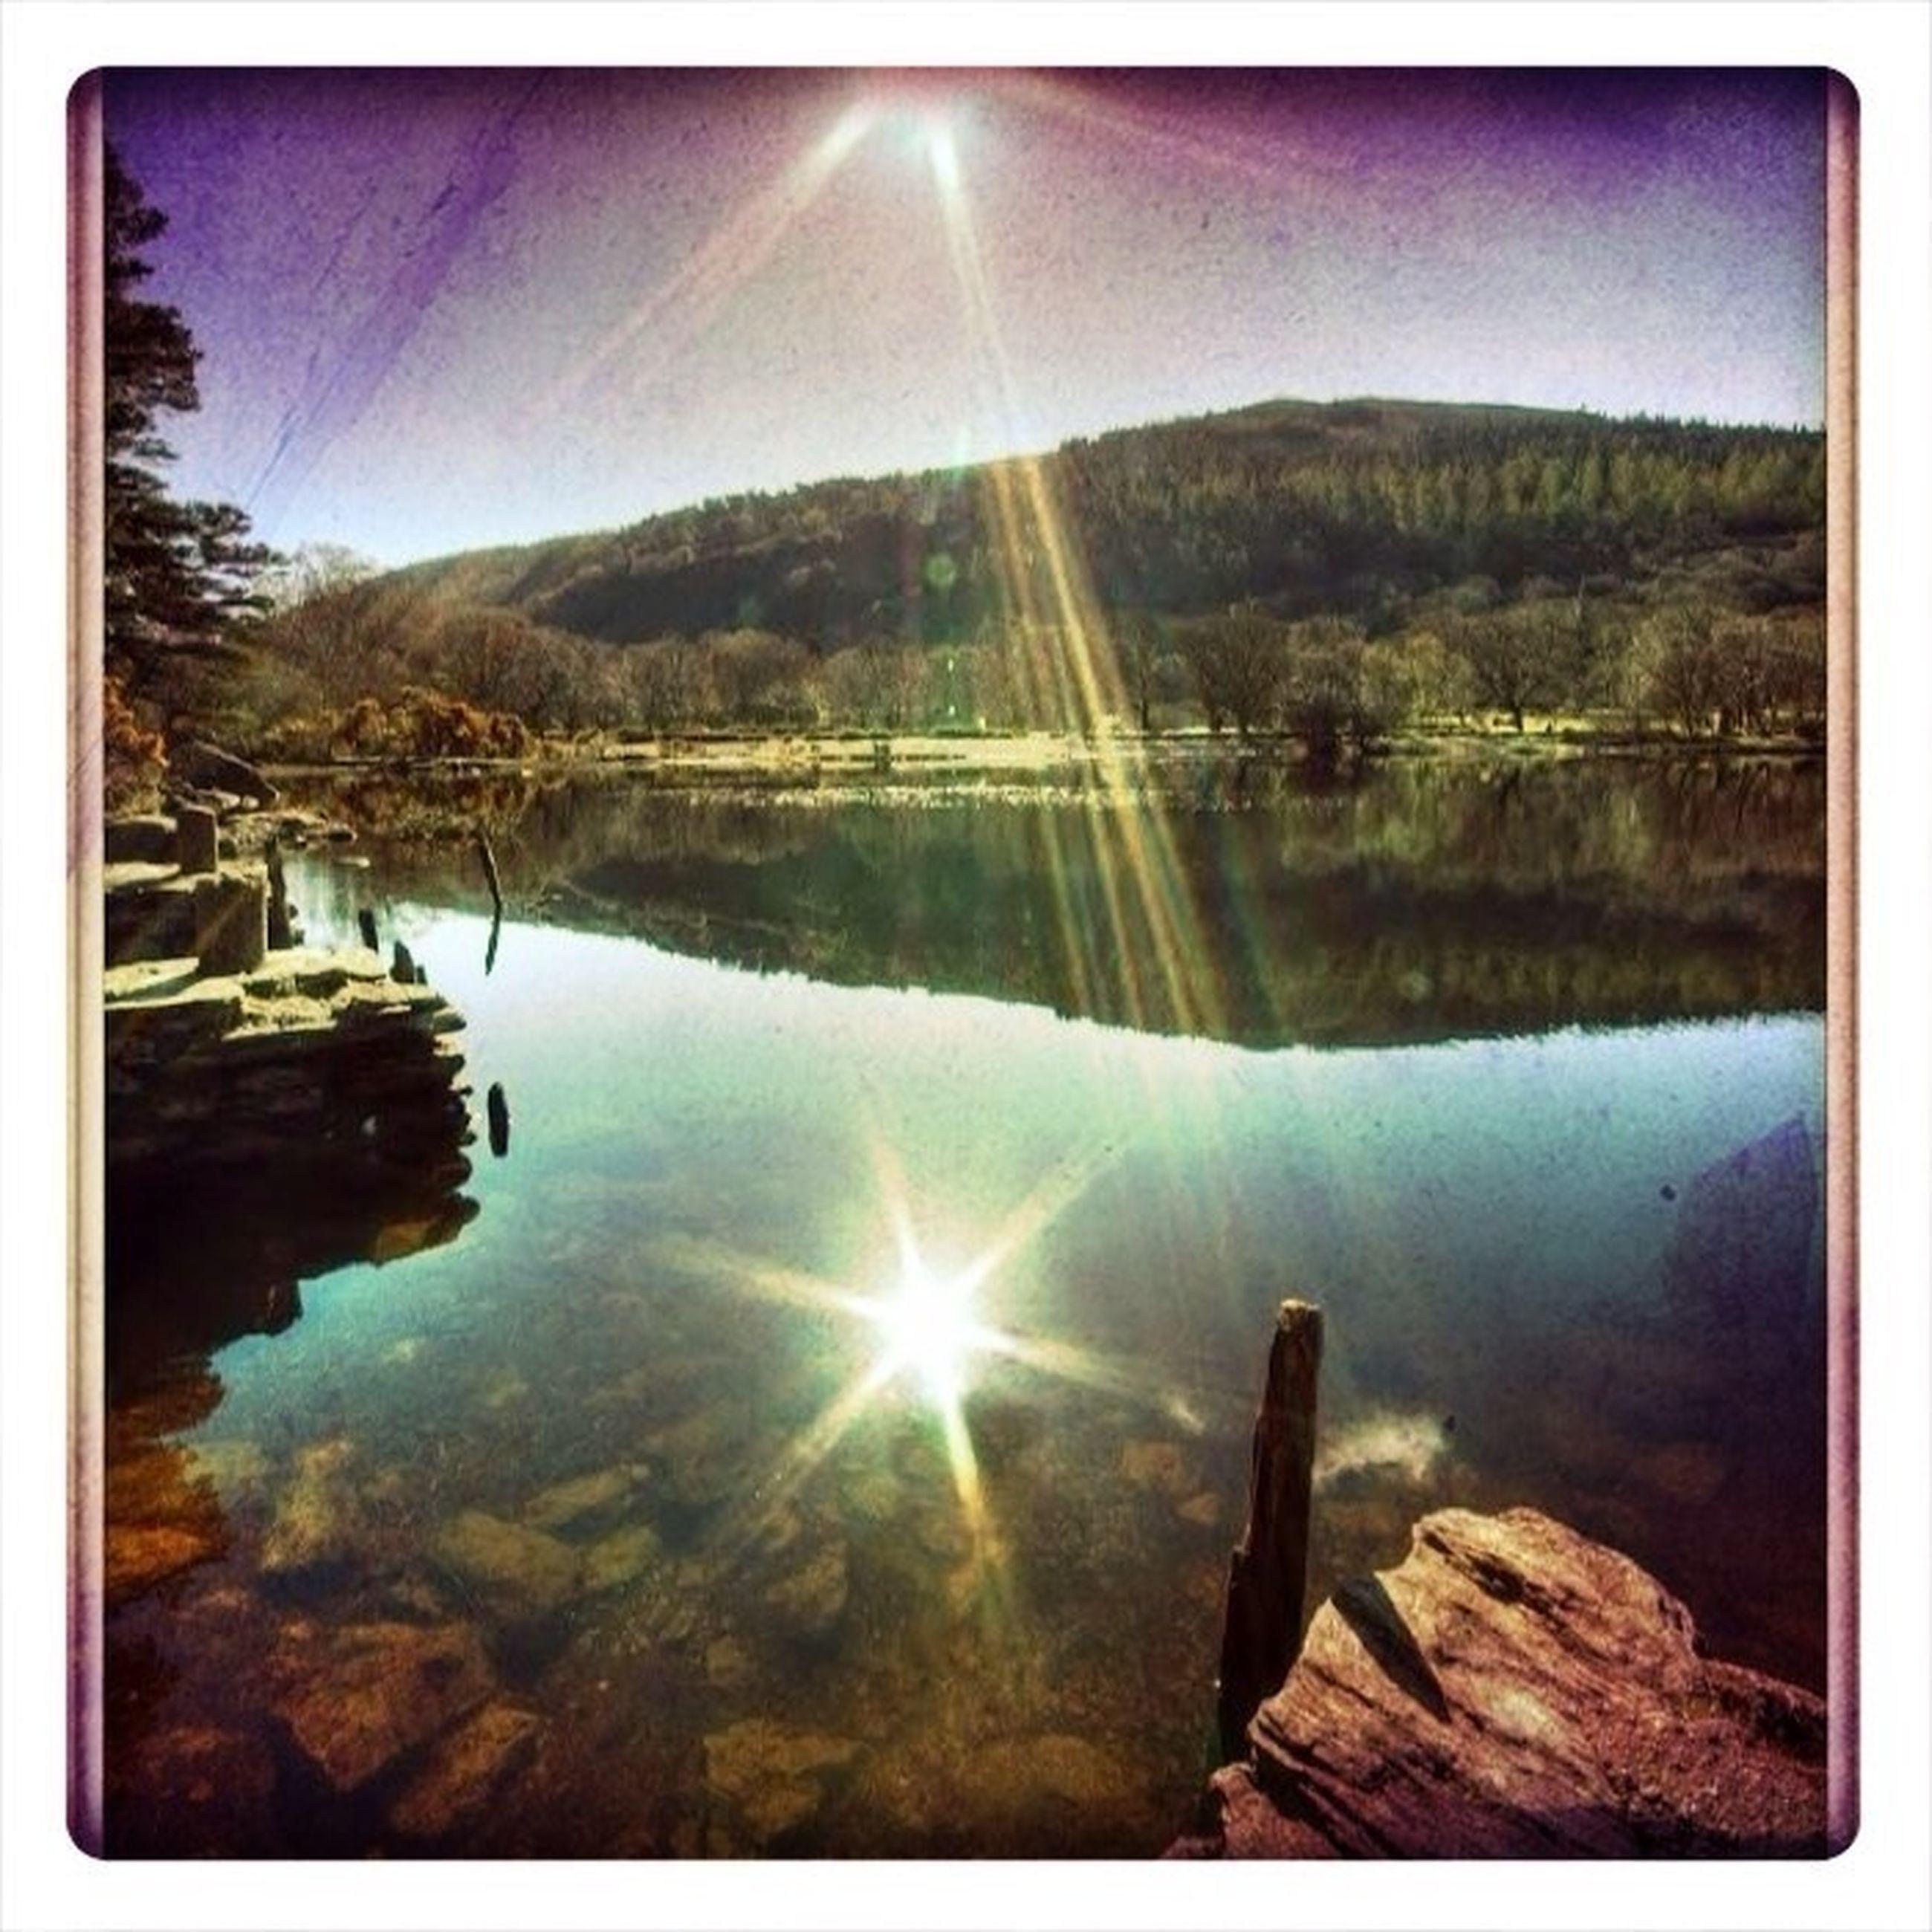 water, reflection, transfer print, tranquil scene, tranquility, lake, scenics, sun, beauty in nature, sunbeam, nature, sunlight, auto post production filter, sky, lens flare, river, idyllic, tree, mountain, non-urban scene